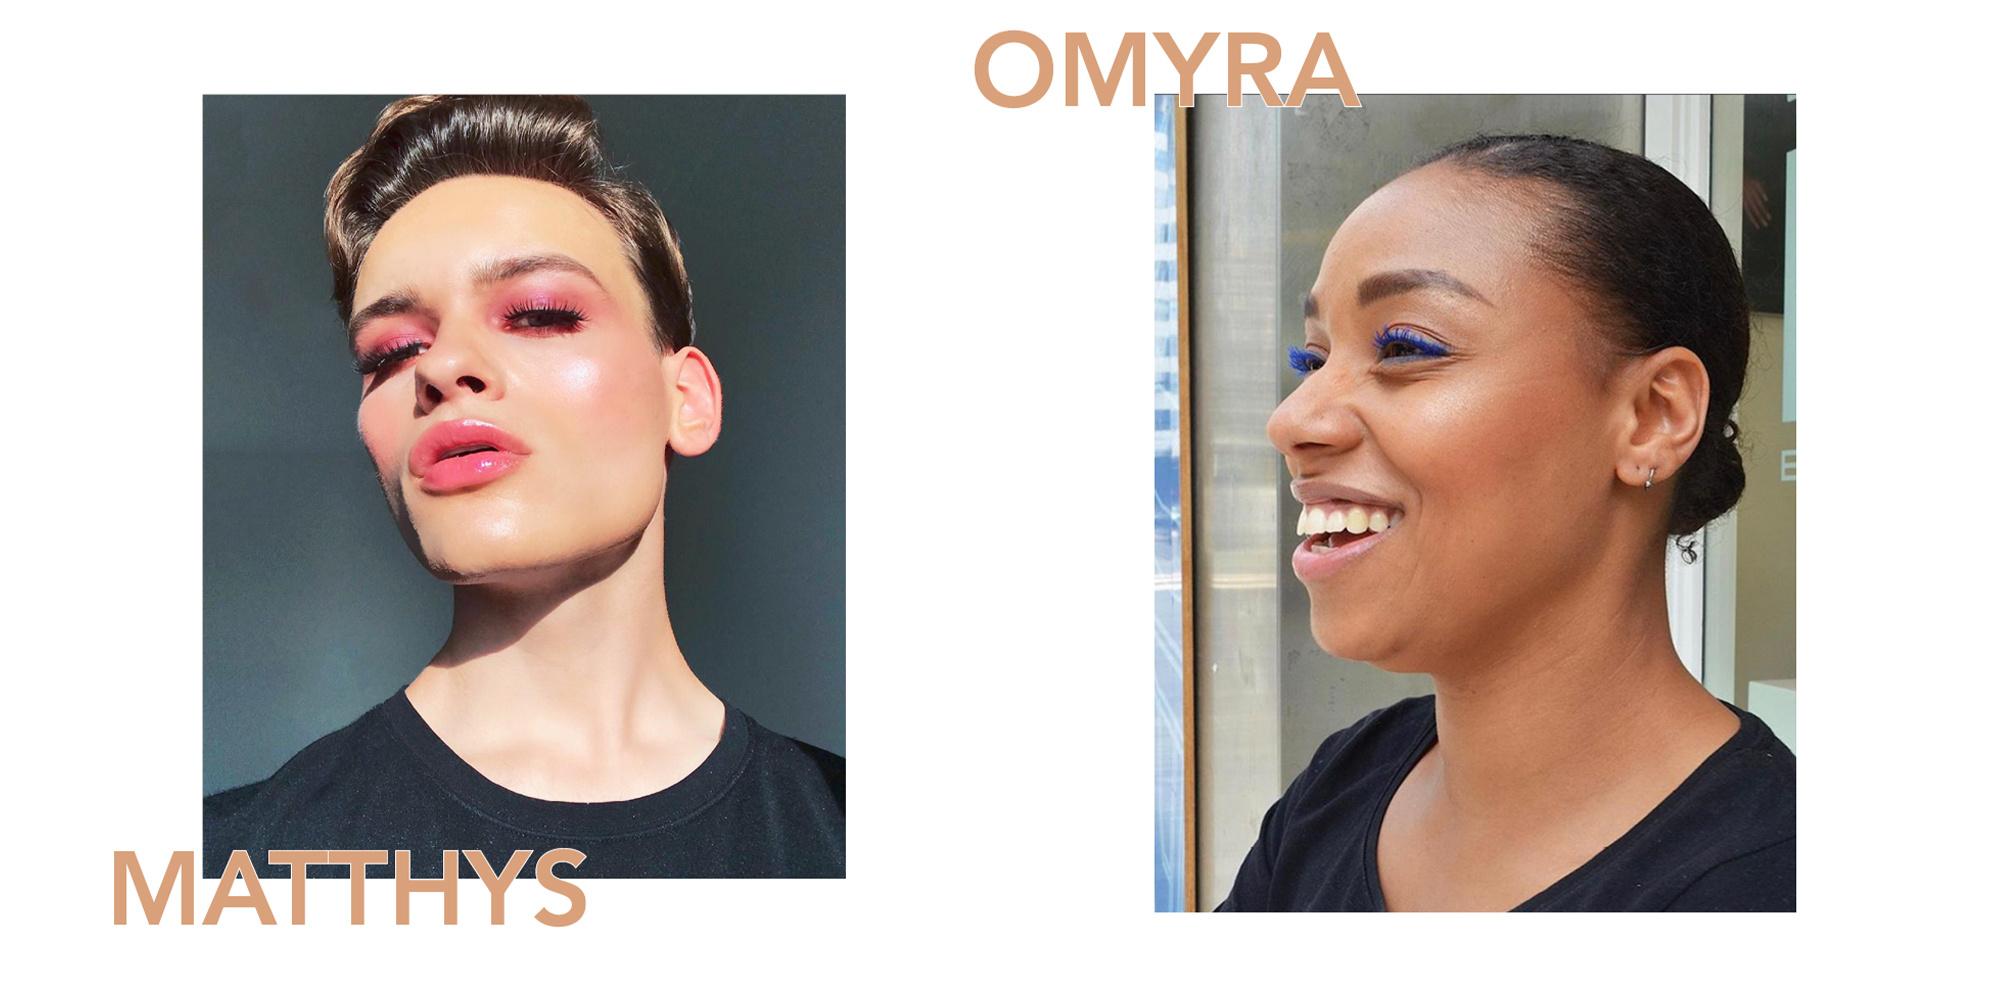 Omyra en Matthys Visagisten BB JO Cosmetics en BeautylooksPlaza Rotterdam interview diversiteit